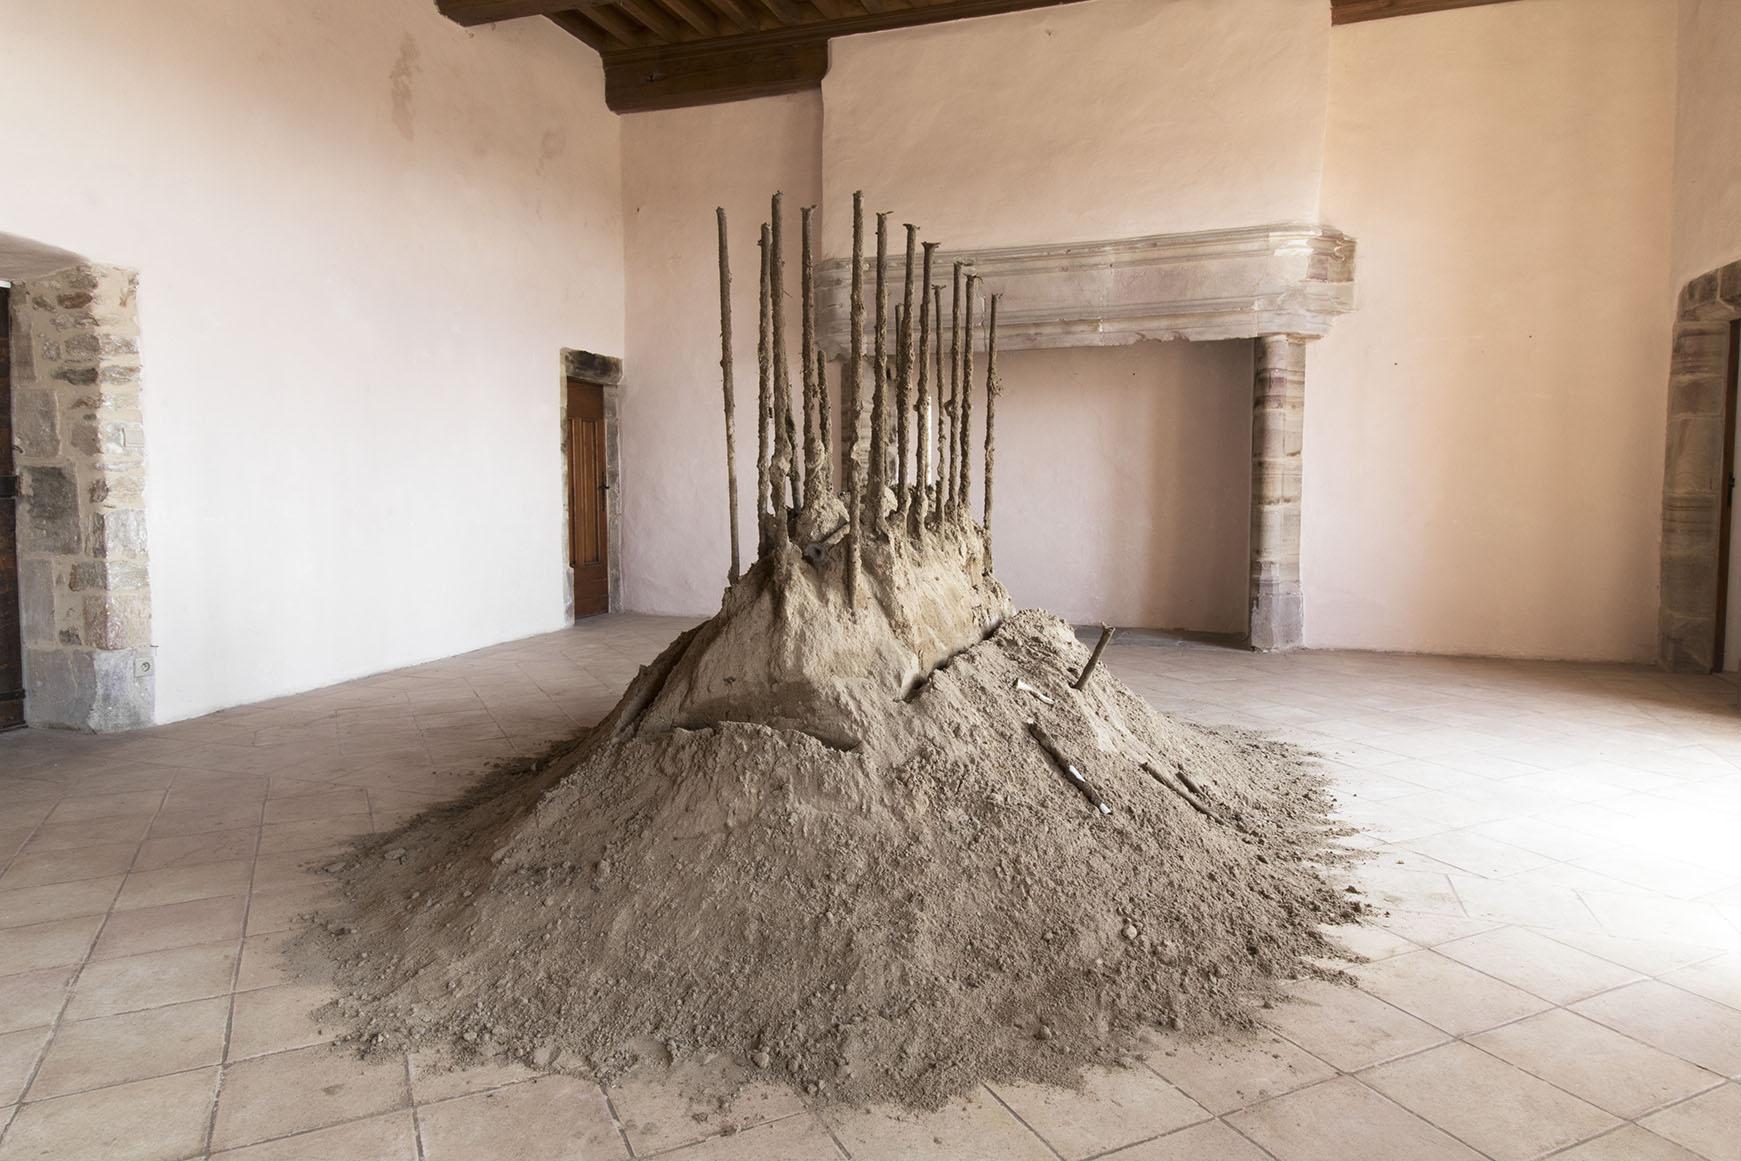 Hugo_Bel_sculpteur_ Échappée_Taurines